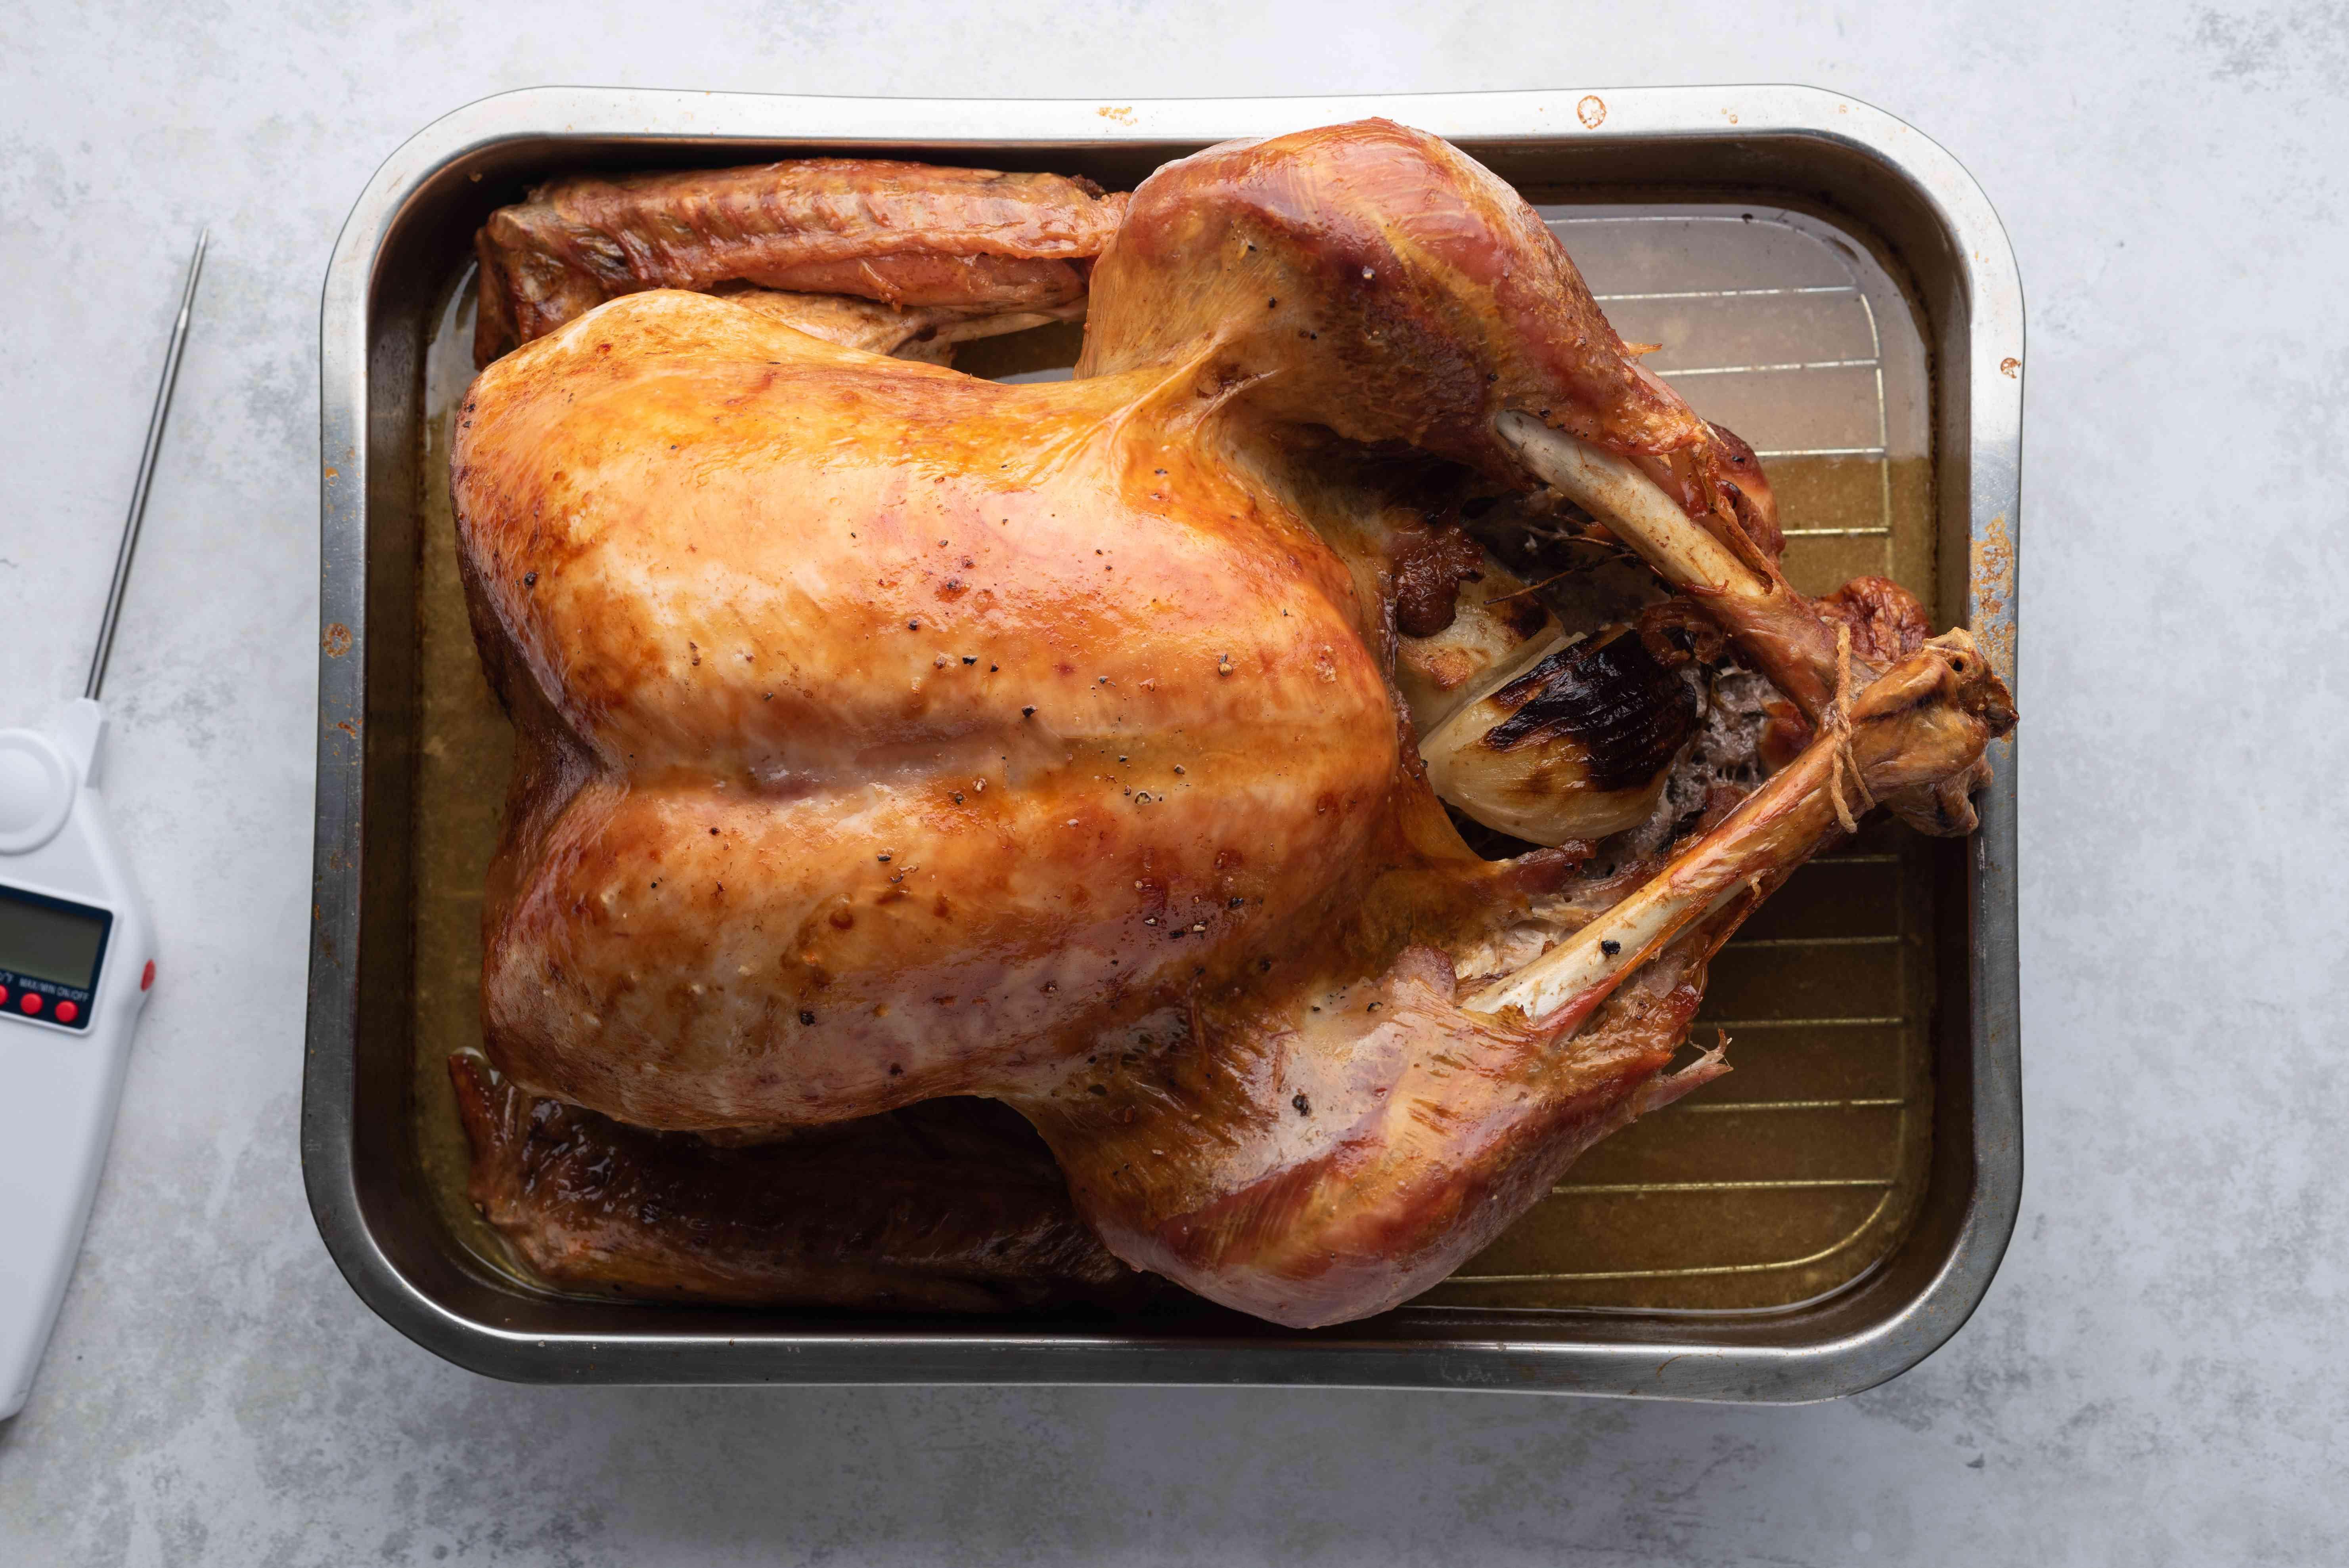 roasted turkey in a roasting pan